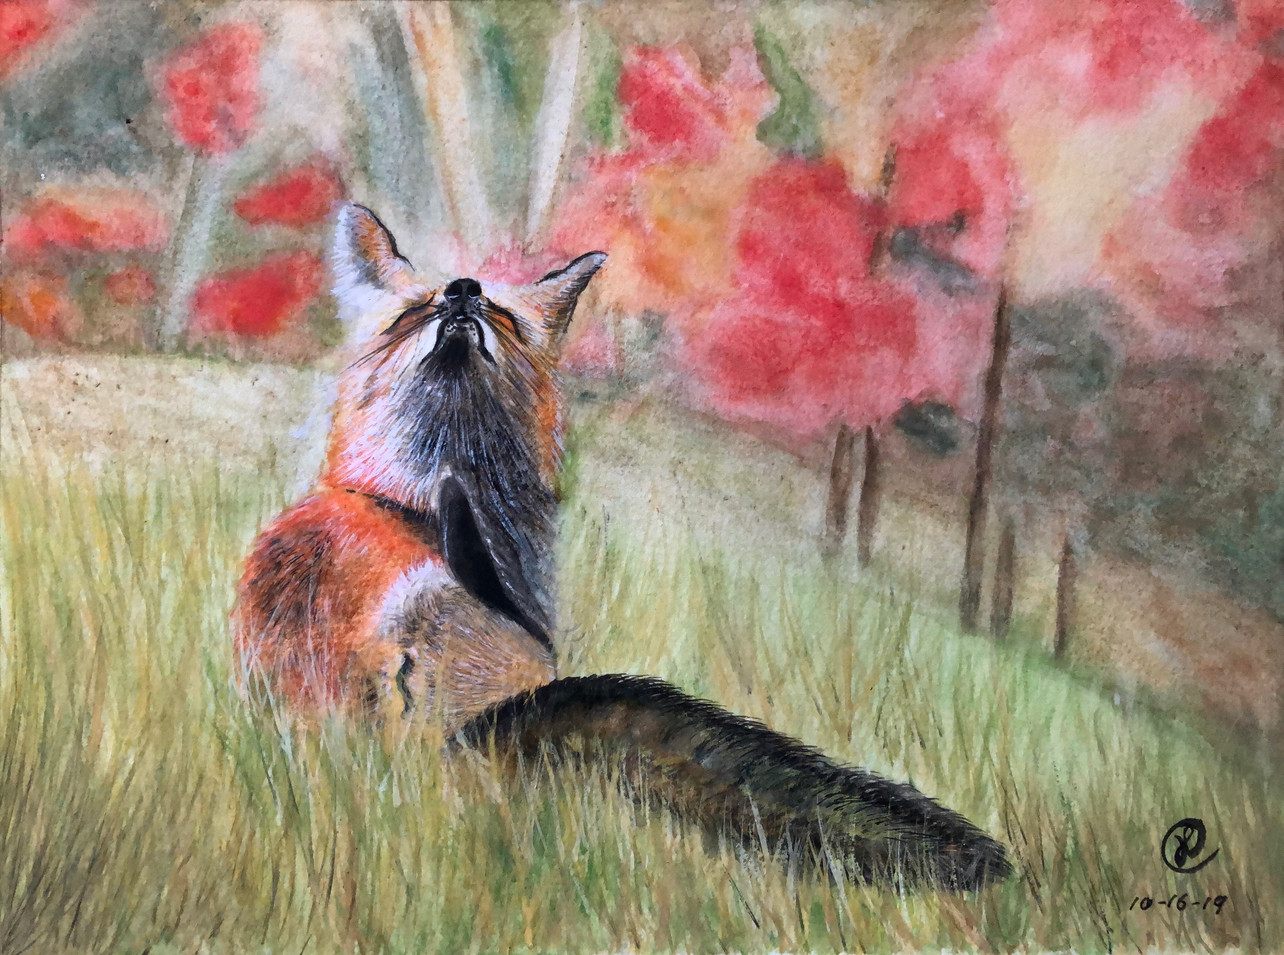 A fox in the fall field